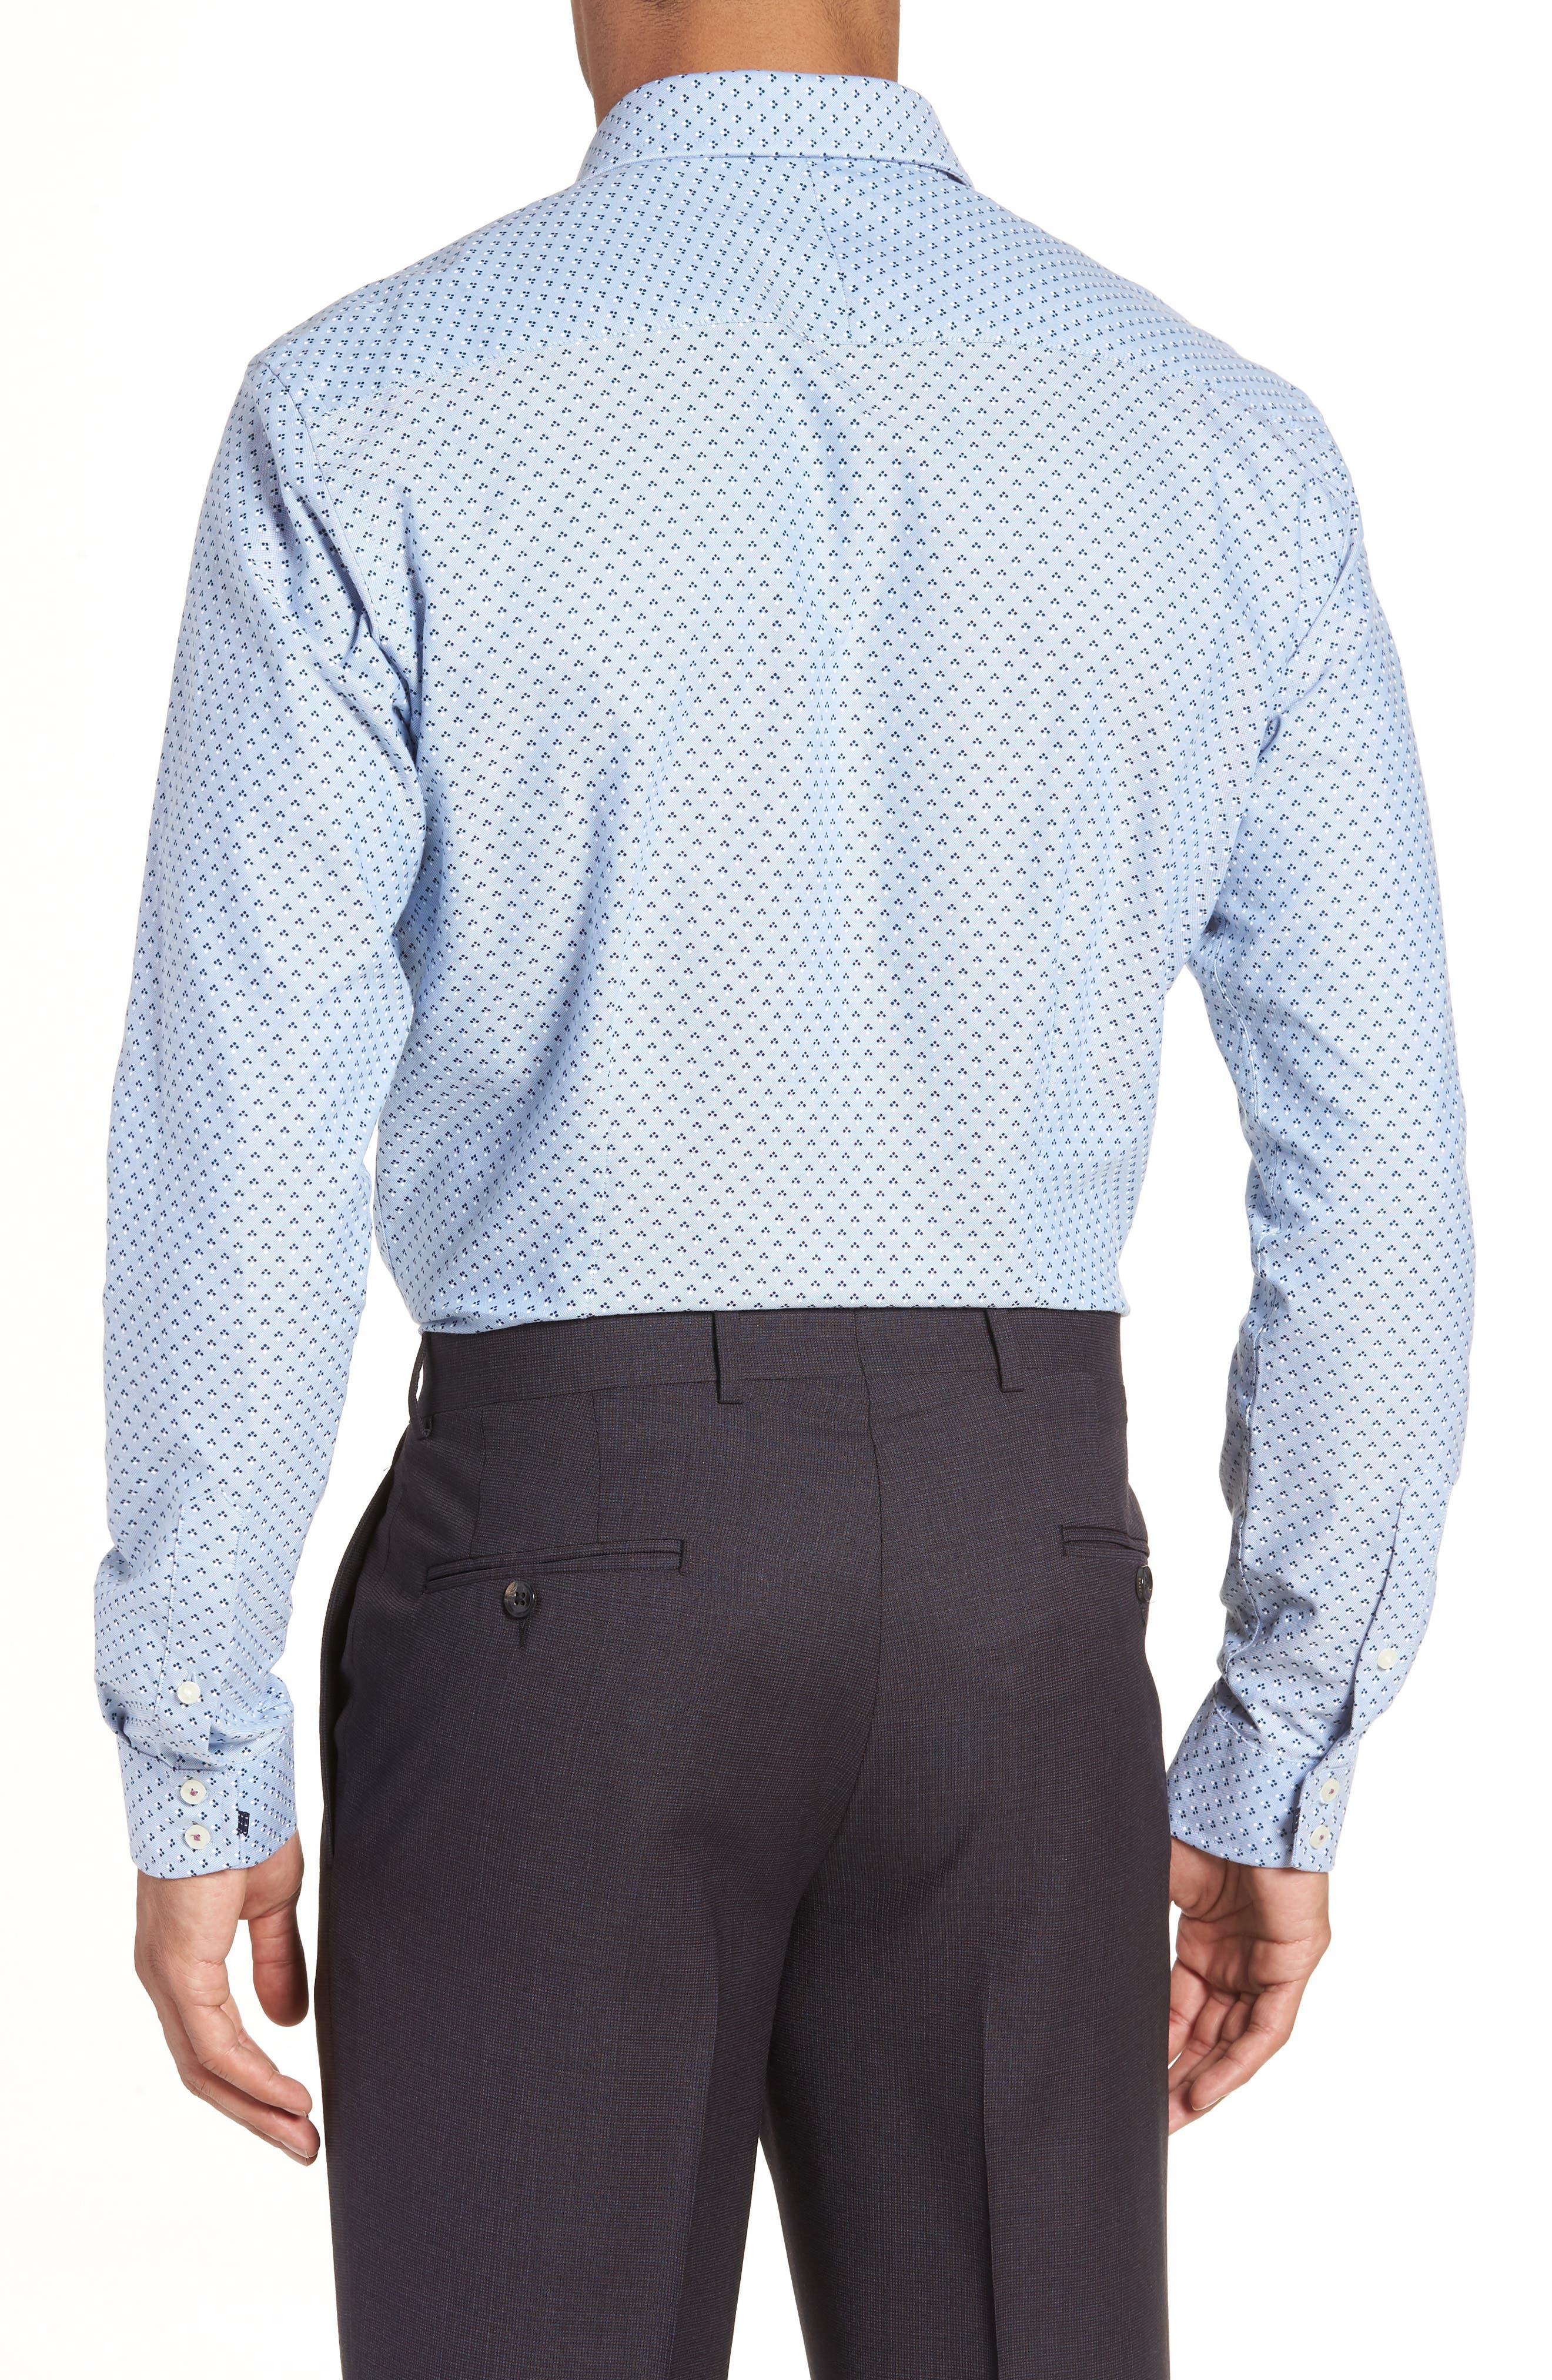 Forestr Trim Fit Geometric Dress Shirt,                             Alternate thumbnail 3, color,                             421